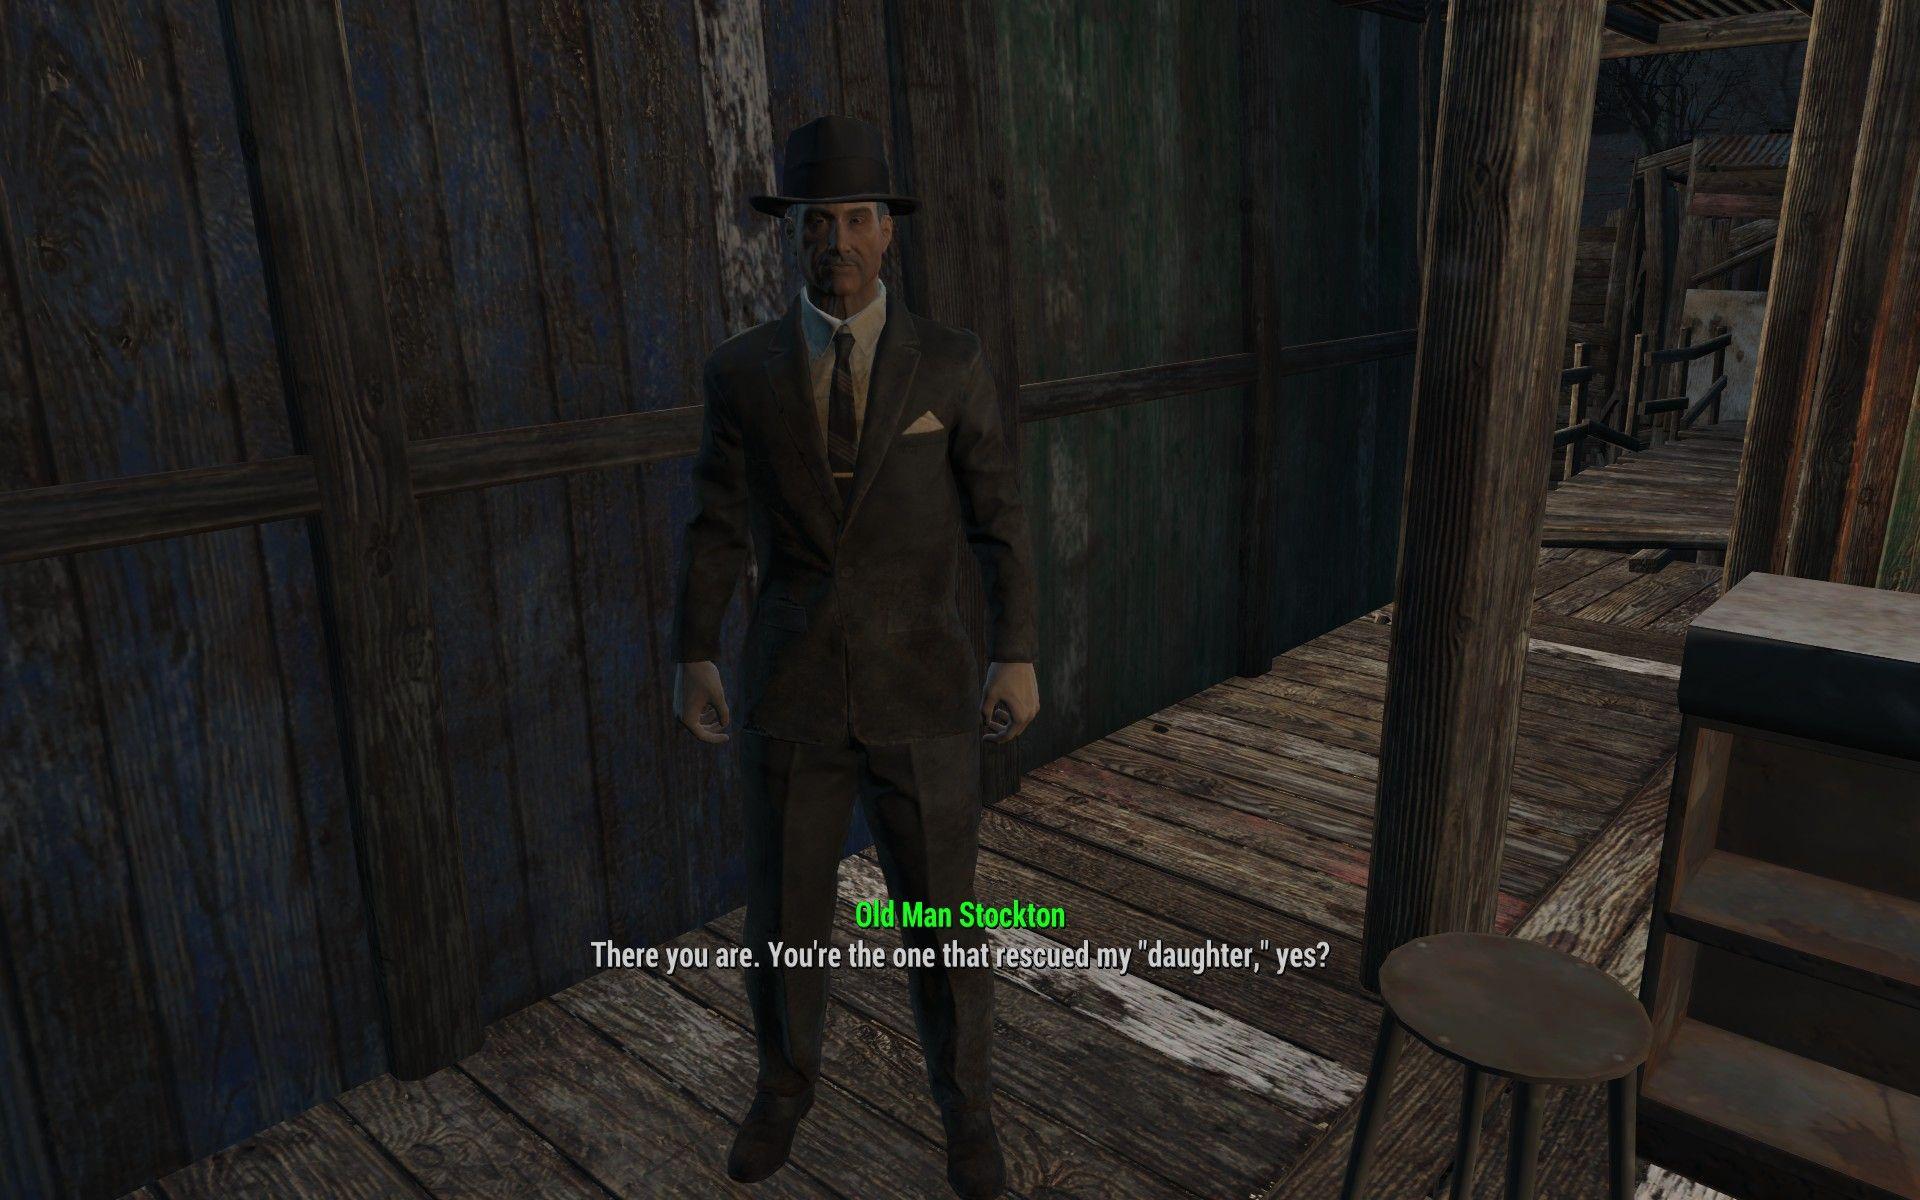 Old man stockton